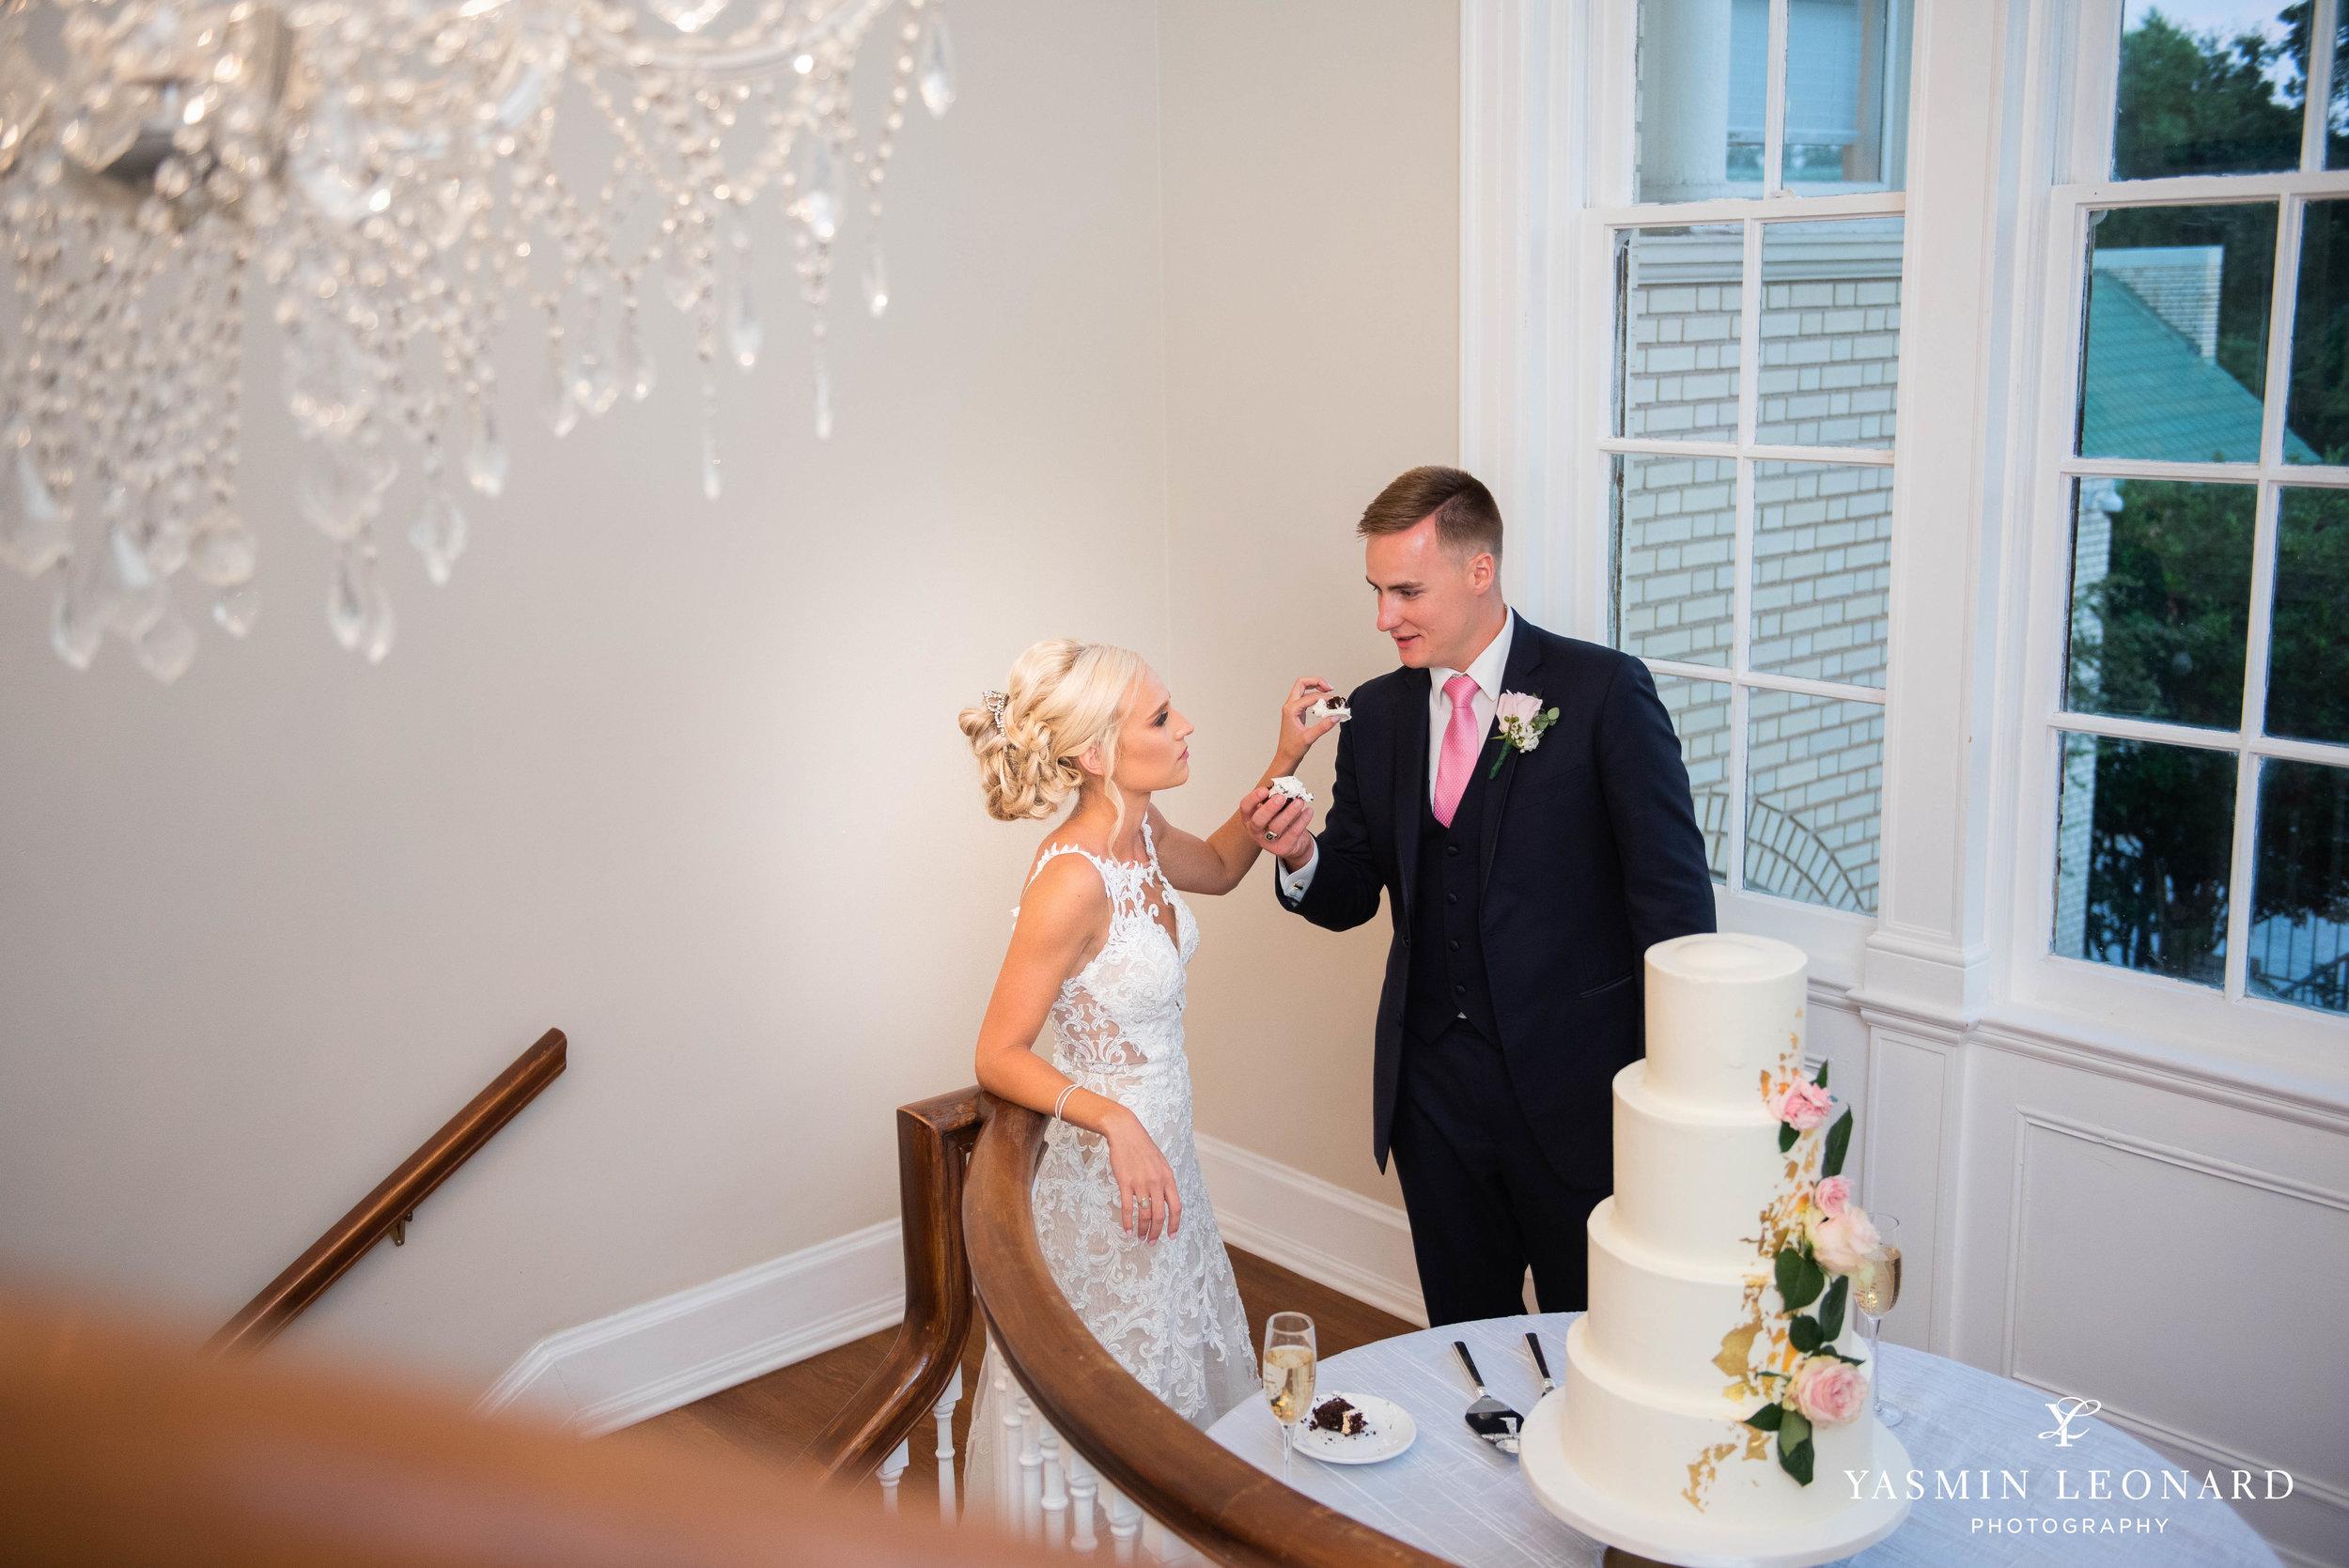 Separk Mansion - NC Weddings - Gastonia Wedding - NC Wedding Venues - Pink and Blue Wedding Ideas - Pink Bridesmaid Dresses - Yasmin Leonard Photography-57.jpg